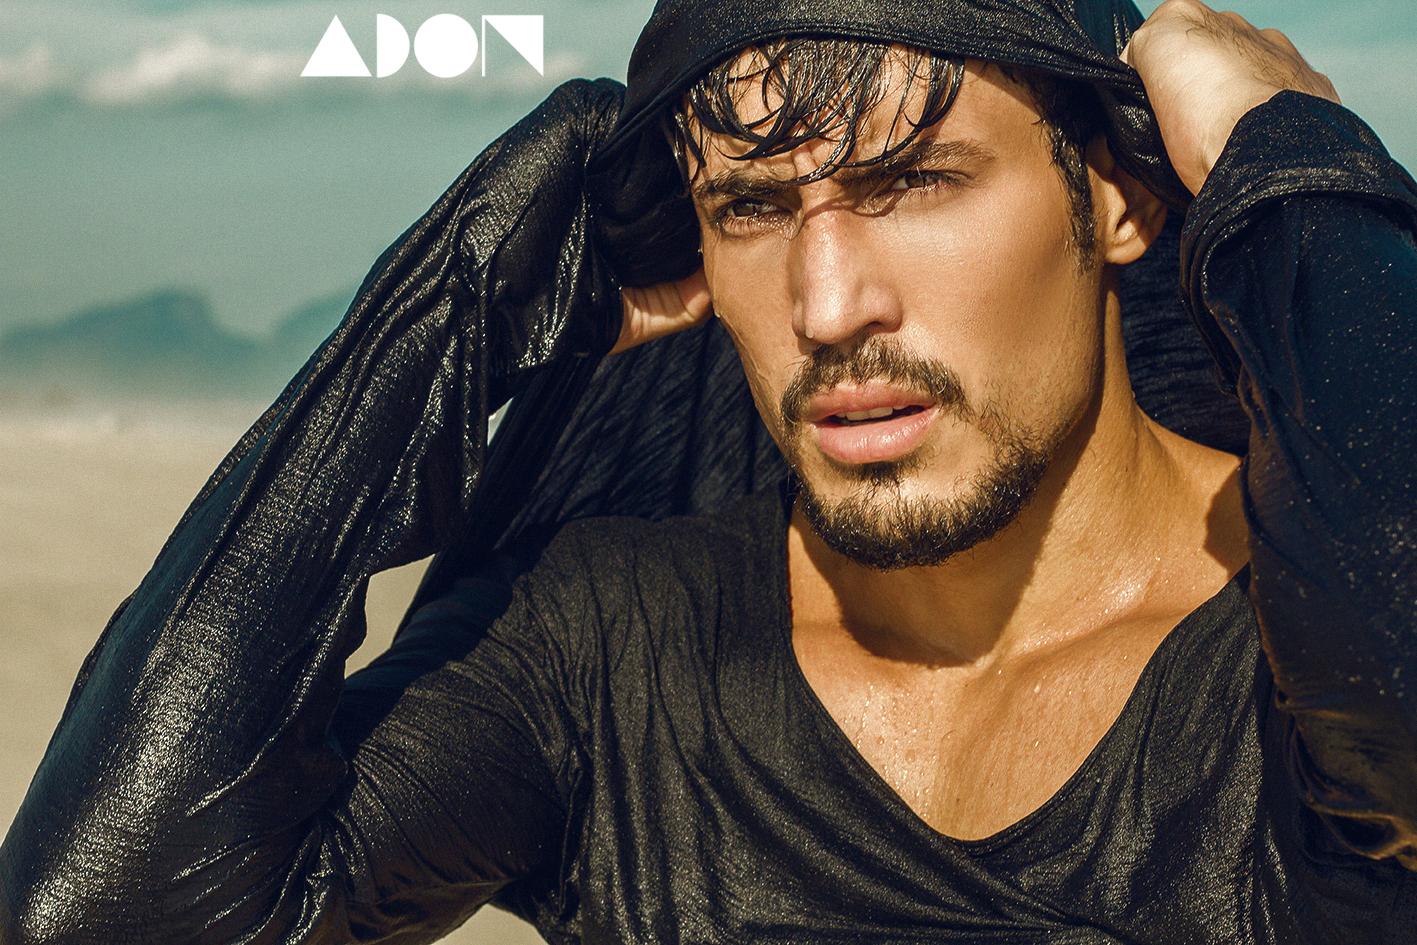 Adon Exclusive: Model HONORATO BABINSKI By SERGIO BAIA